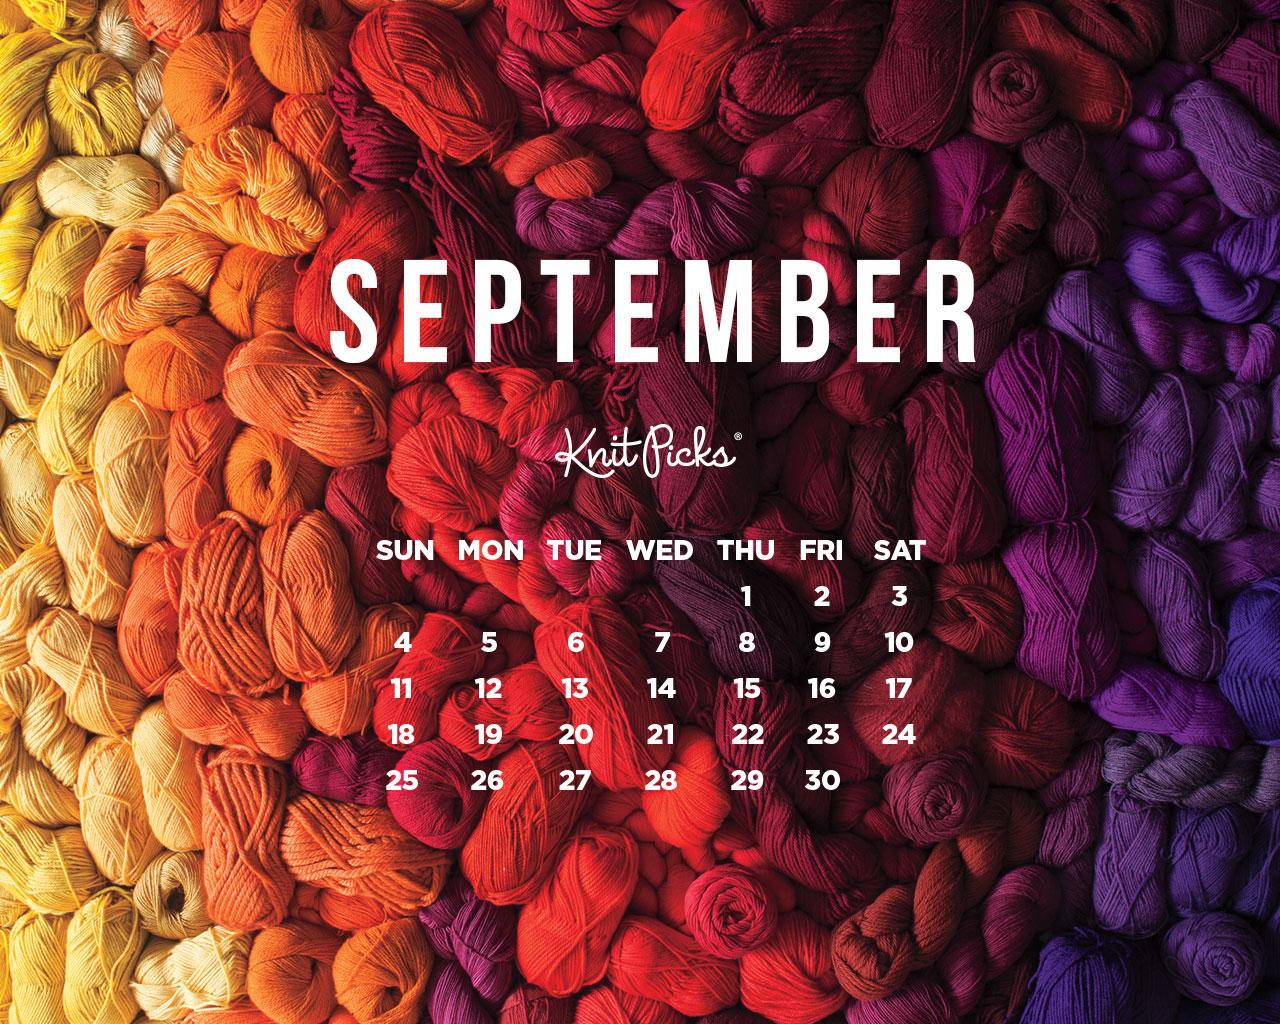 September 2016 CALENDAR - KnitPicks Staff Knitting Blog